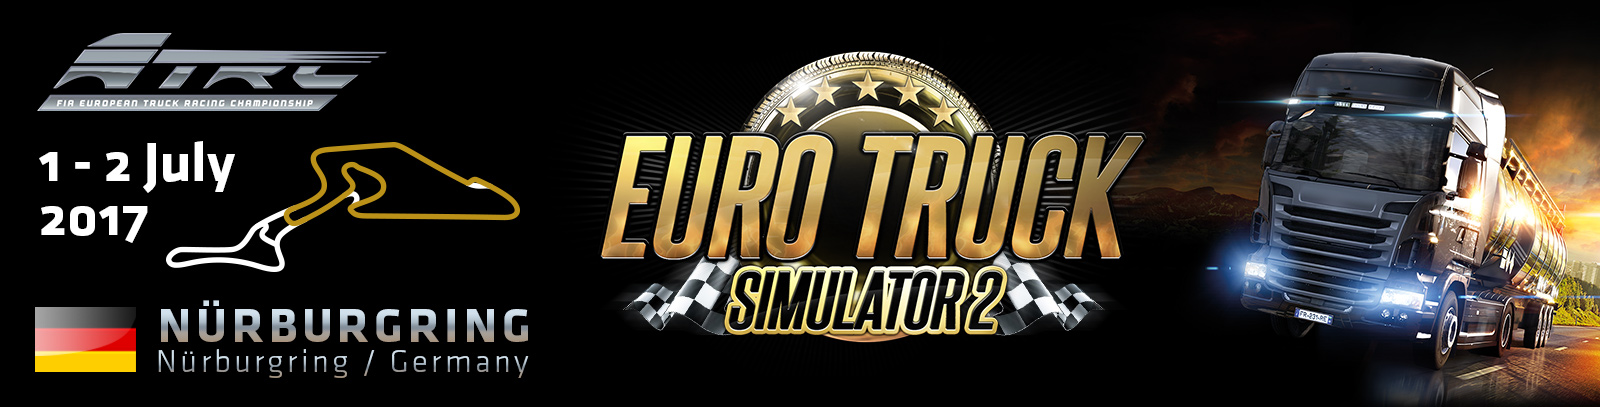 ETRC 2017